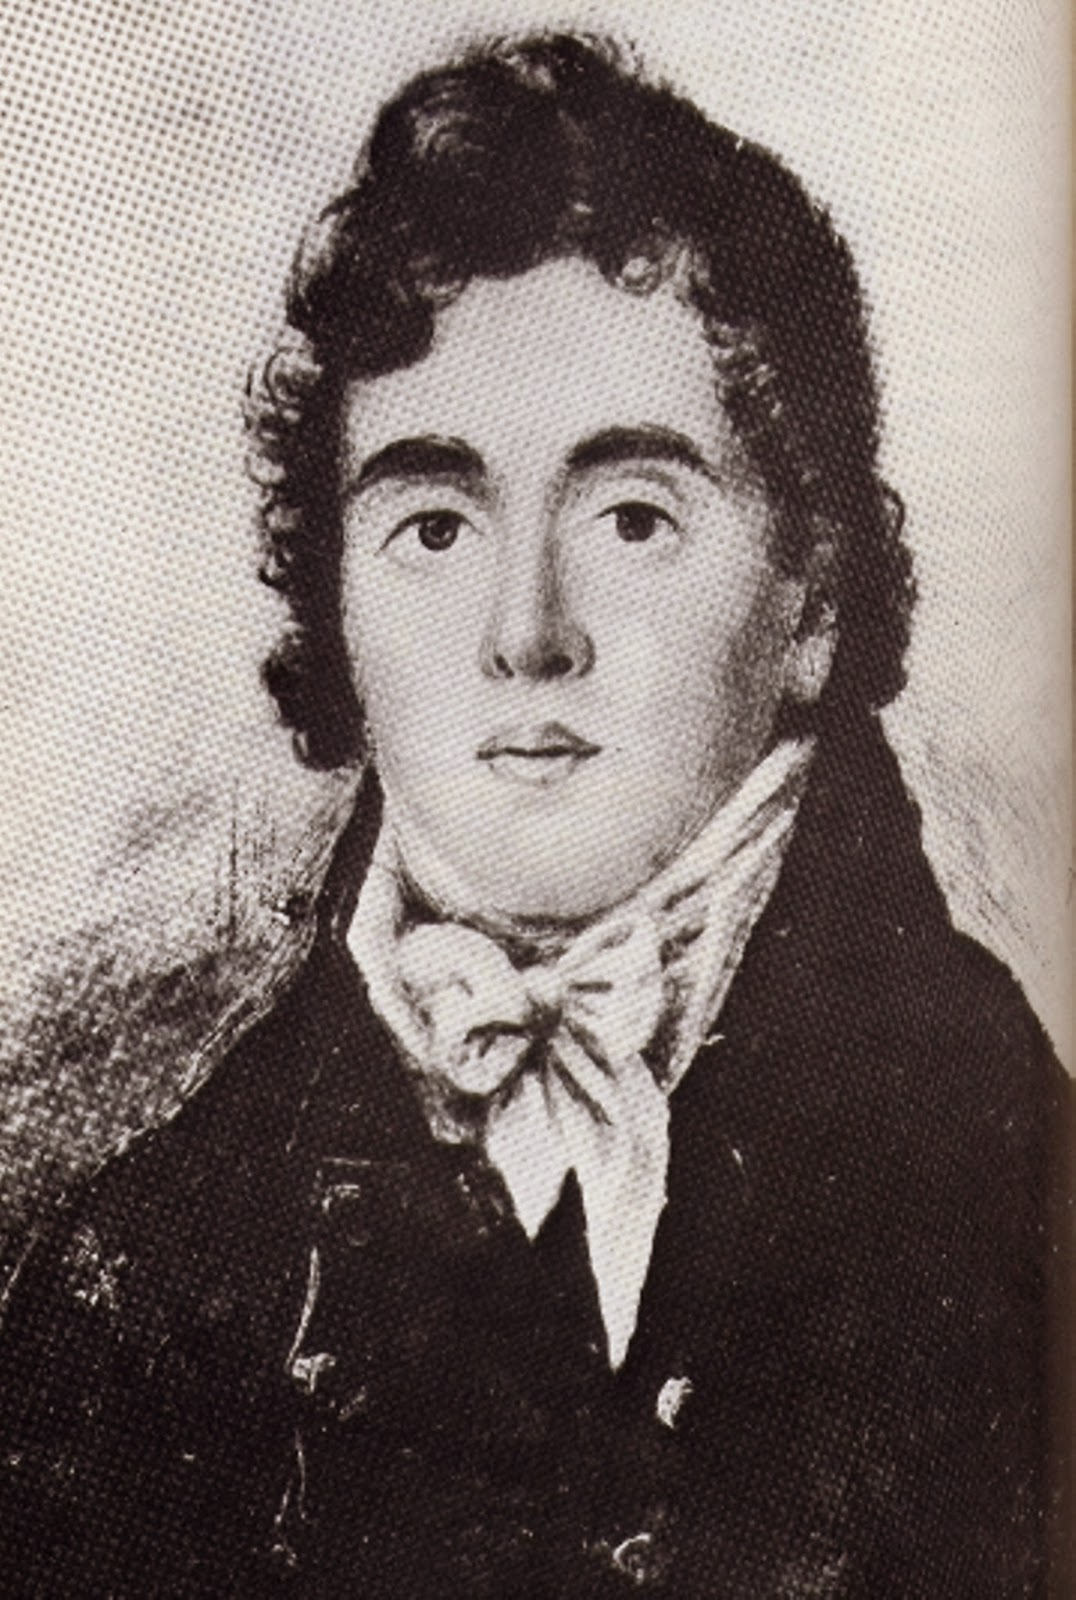 Beau Brummell. ¿El primer gran dandy?